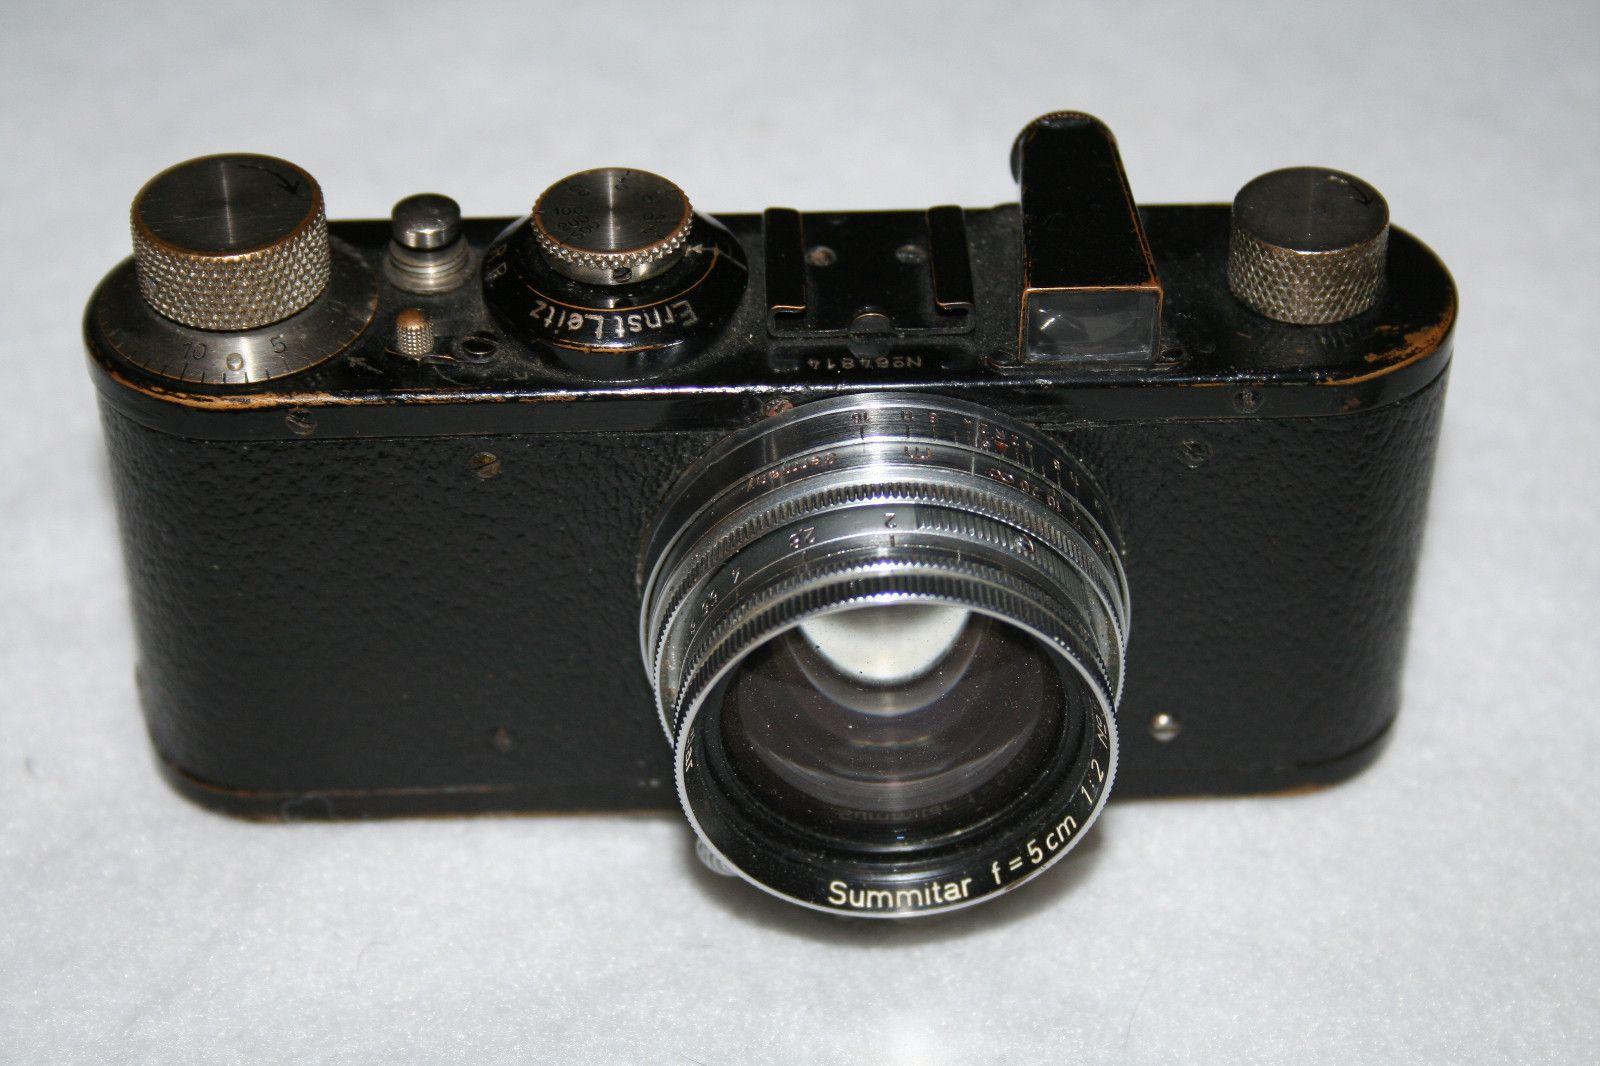 Leica I Made in 1931 with 1950 Summitar F 5cm 1 2 Lens Plus Lens Cap   eBay